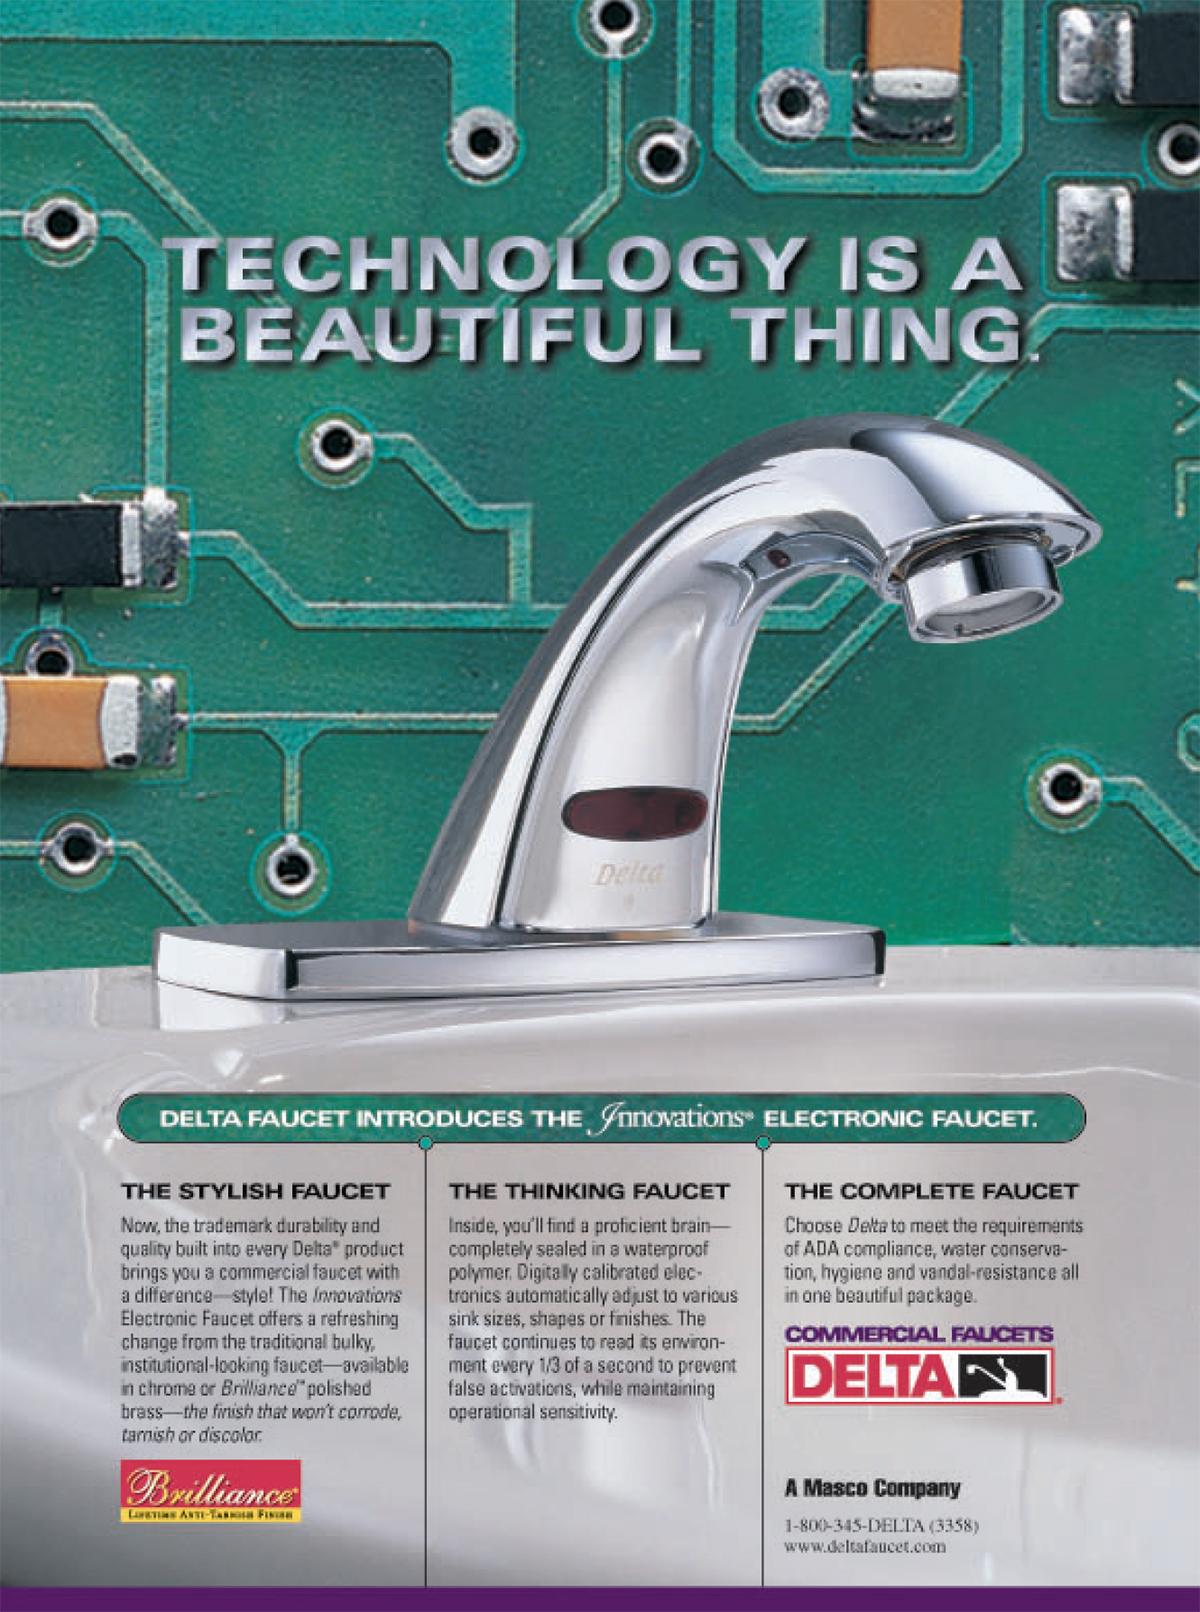 delta faucet happy monday creative